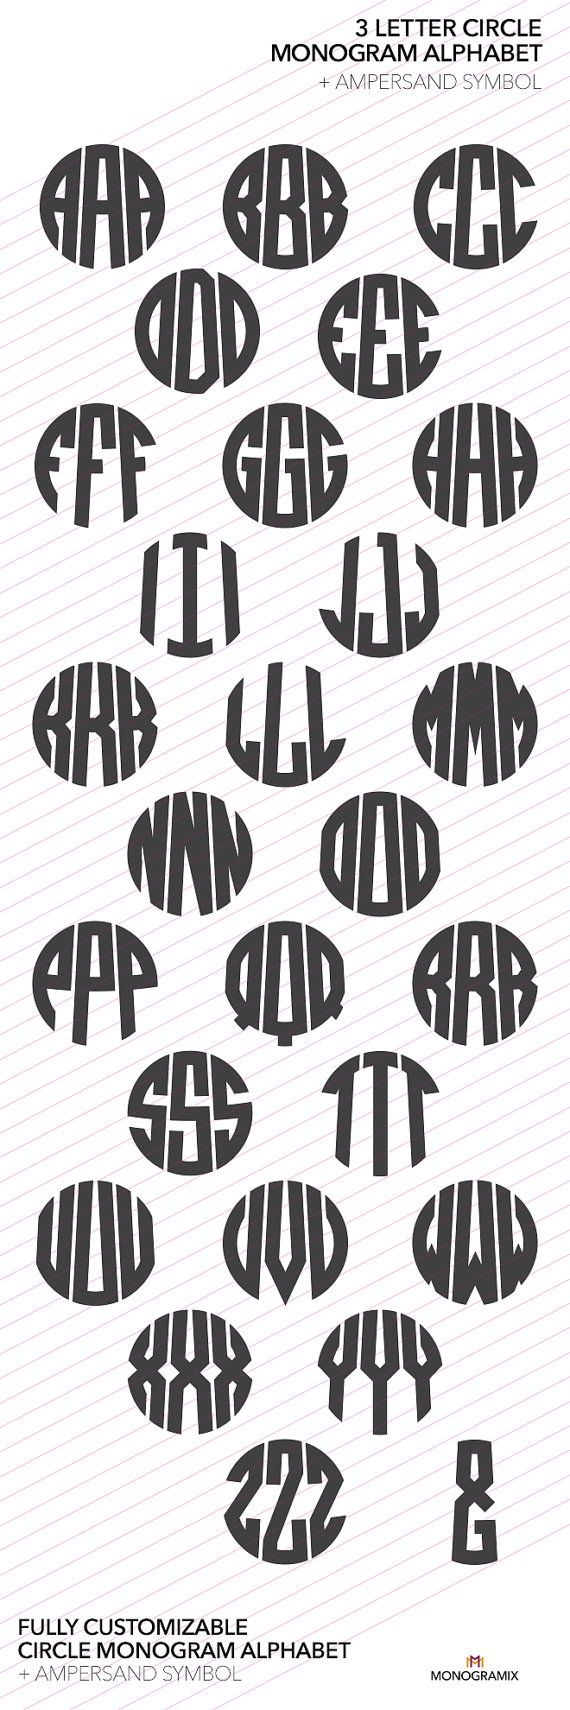 3 Letter Circle Monogram Alphabet Ai Eps Svg Dxf By Monogramix